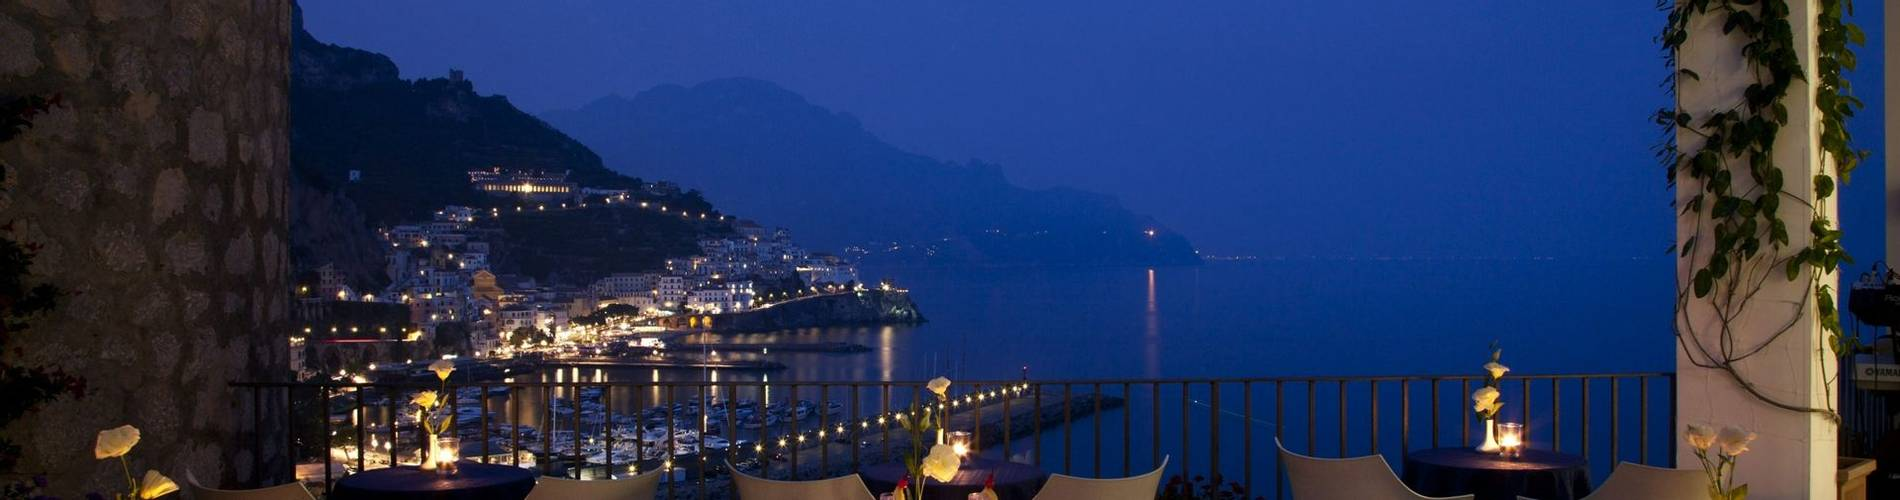 Miramalfi, Amalfi Coast, Italy (14).jpg